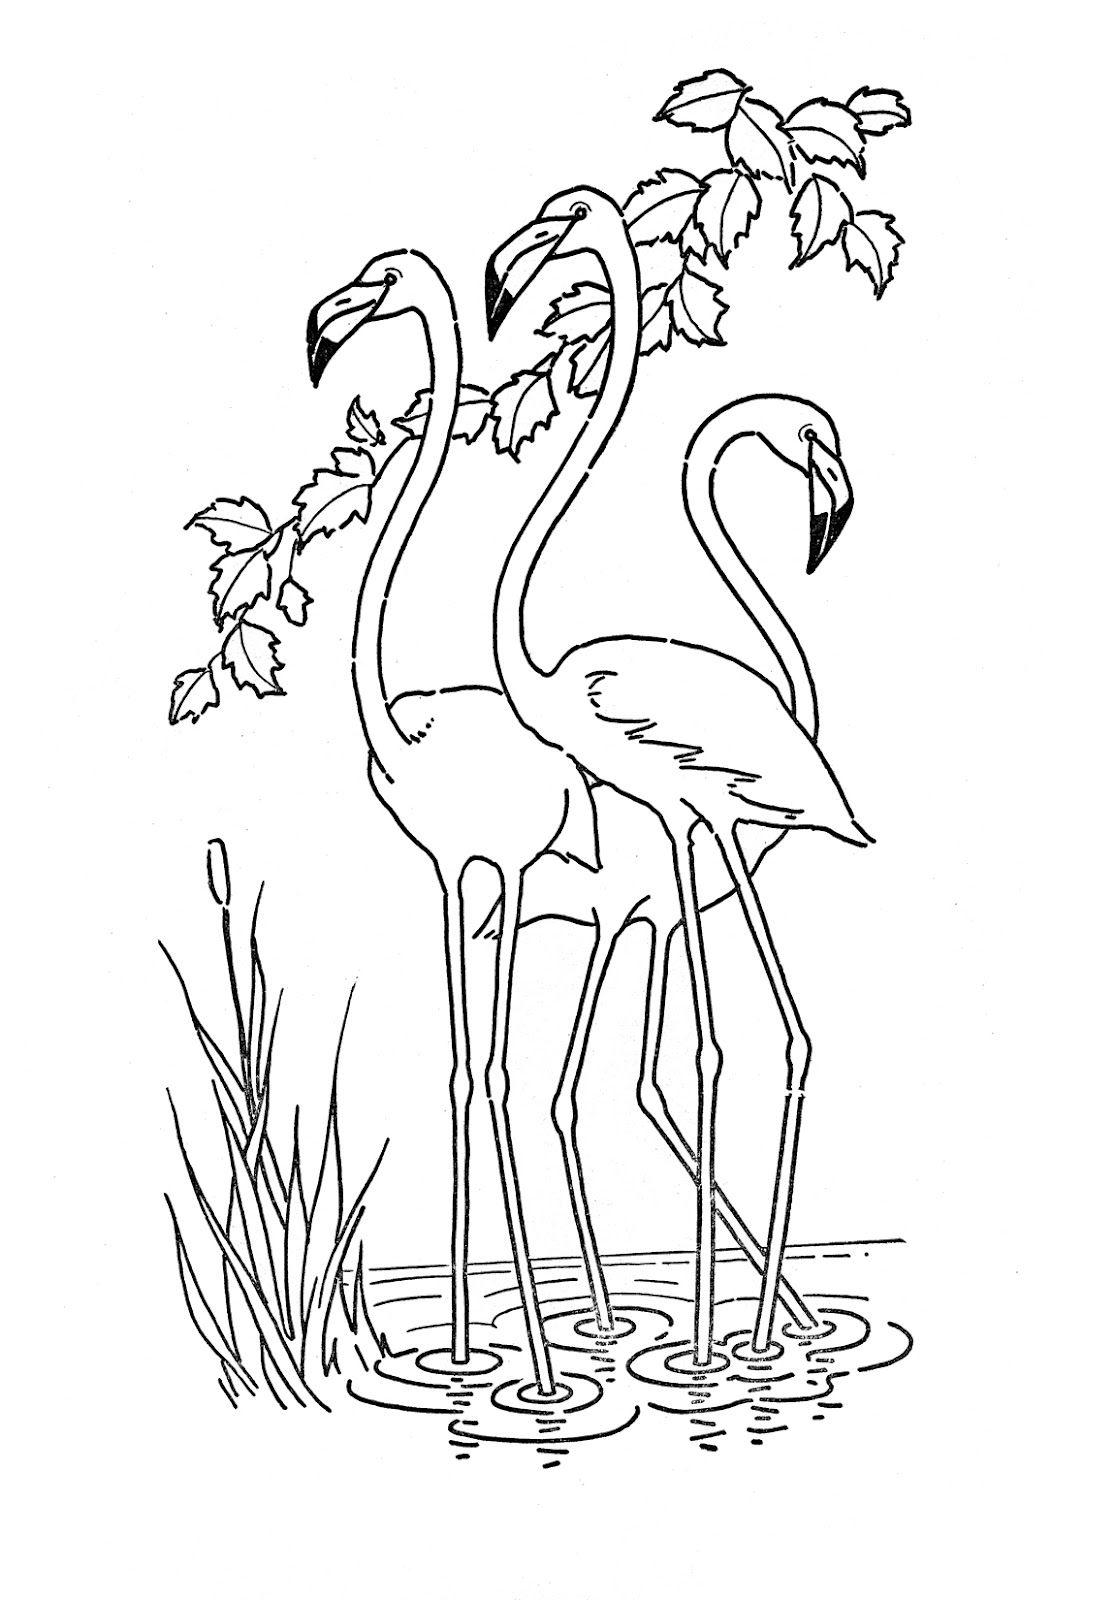 ColorPage-Flamingos-Graphics-Fairysm.jpg (1115×1600) | Printables ...